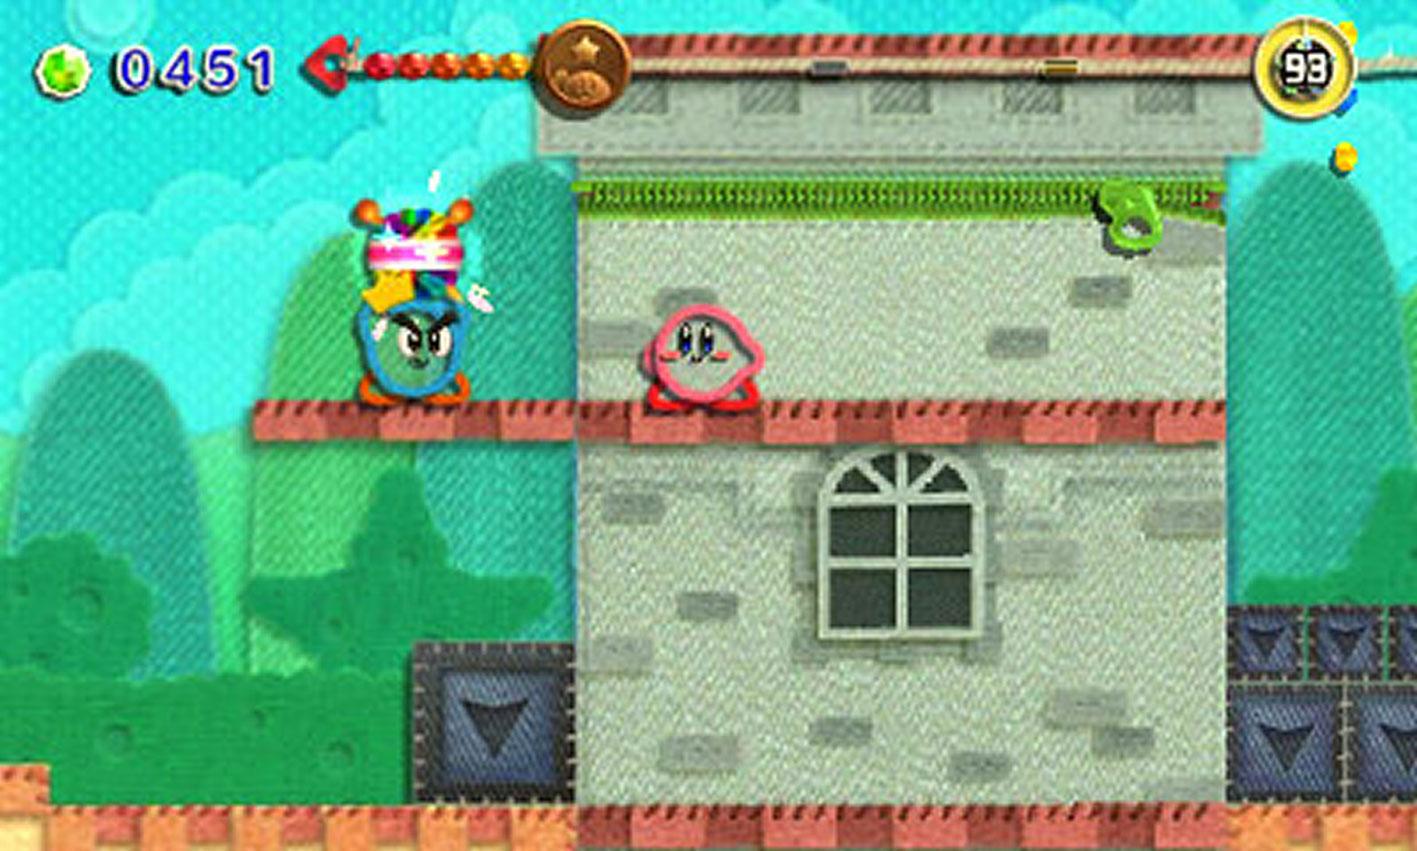 KirbysExtraEpicYarn_3DS_Review2.jpg